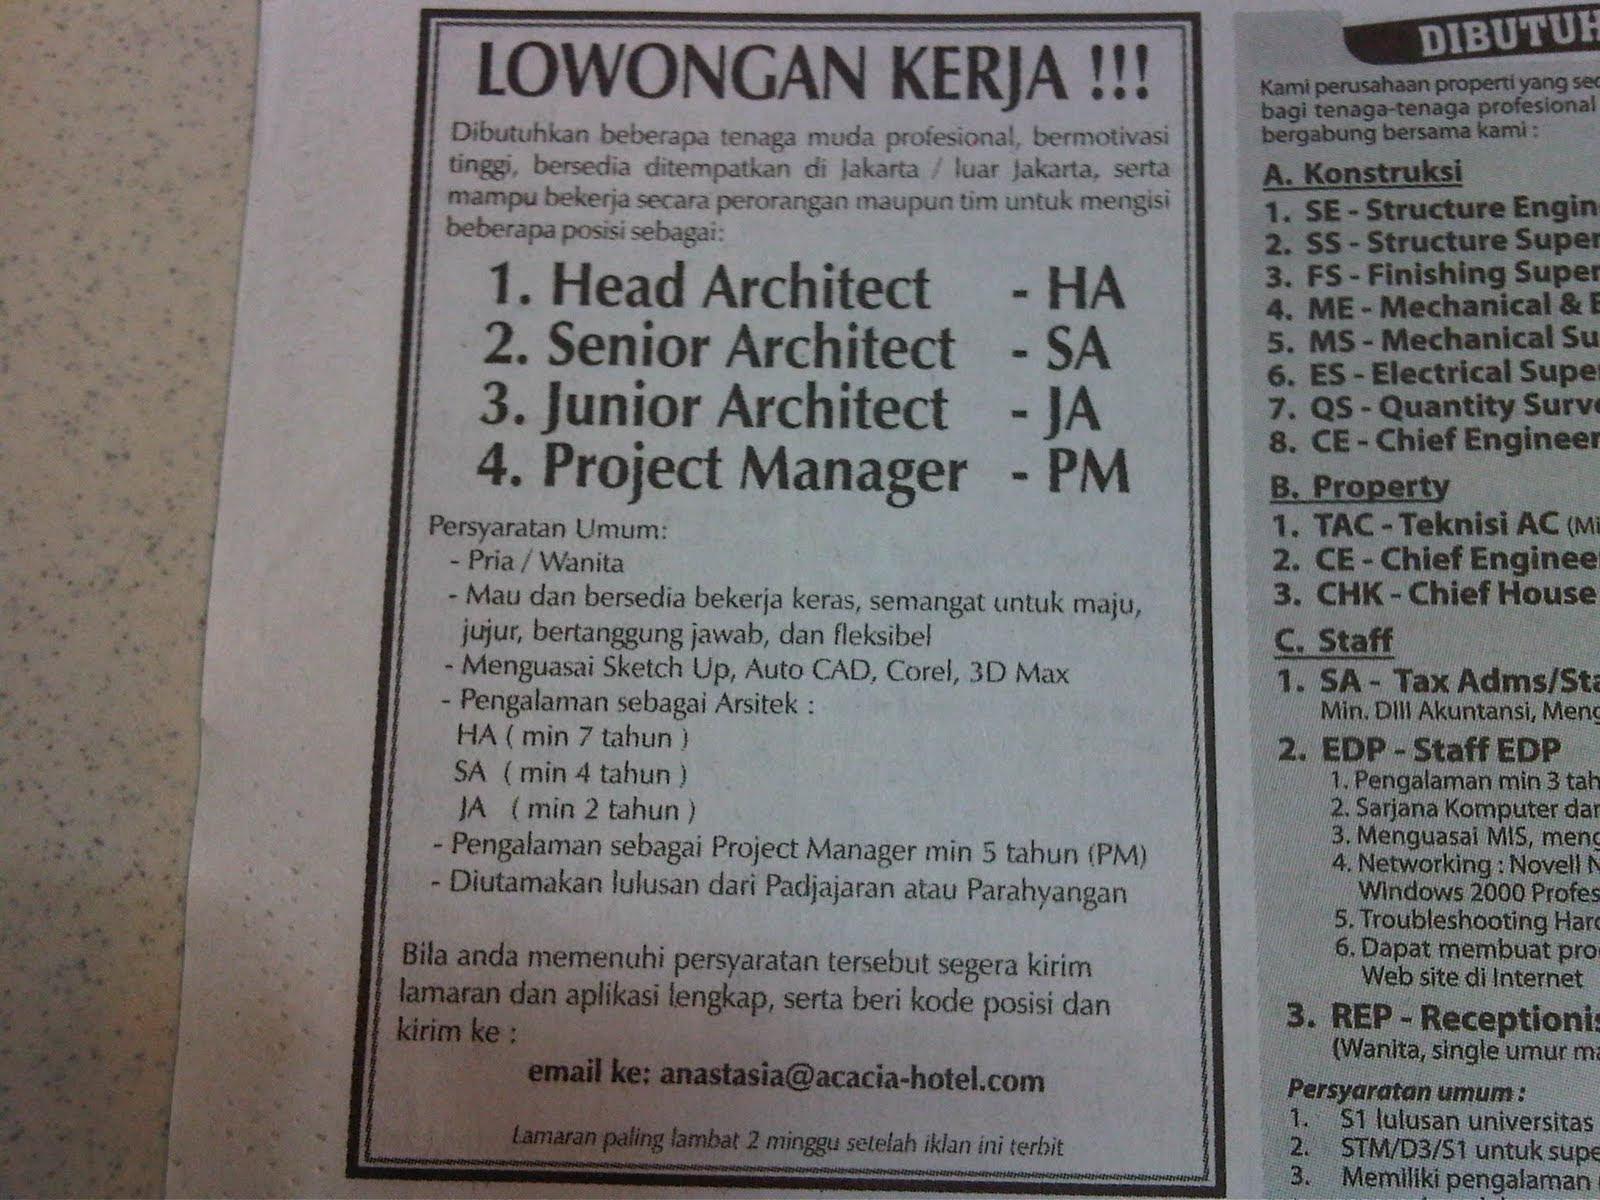 Lowongan Kerja Surabaya Jobsdb - Ndang Kerjo